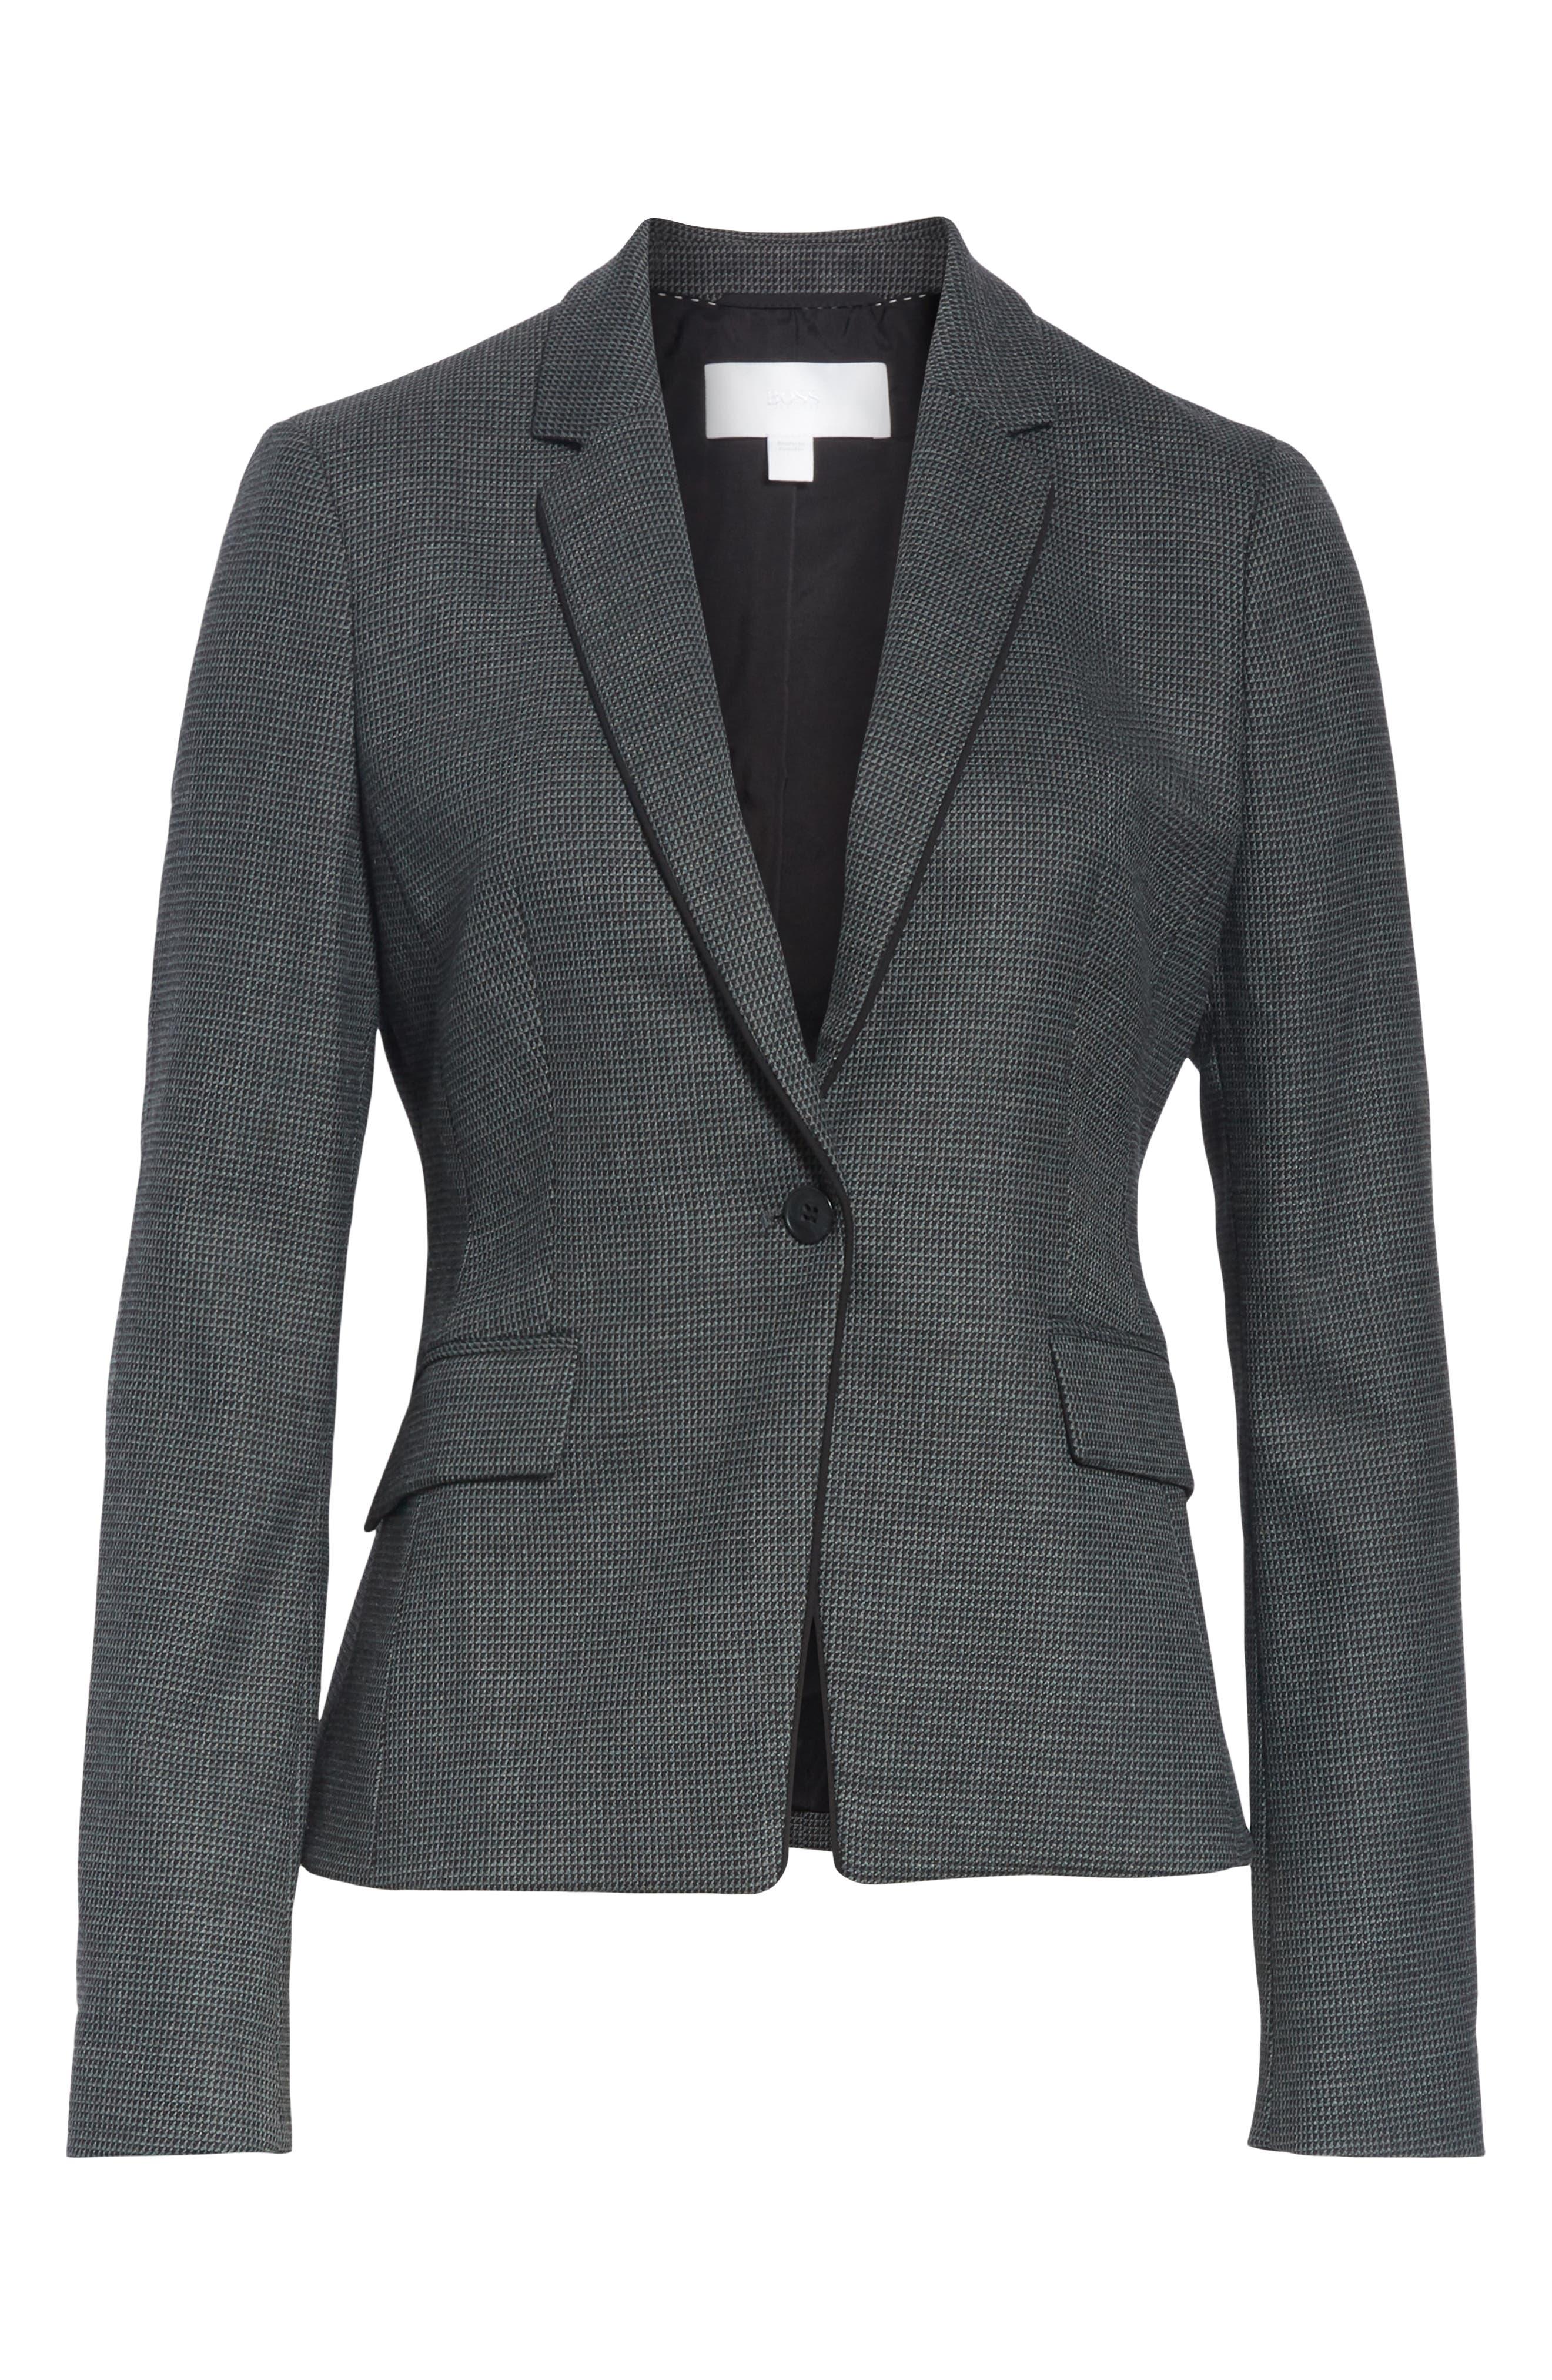 Jorita Geometric Wool Blend Suit Jacket,                             Alternate thumbnail 5, color,                             GREY FANTASY